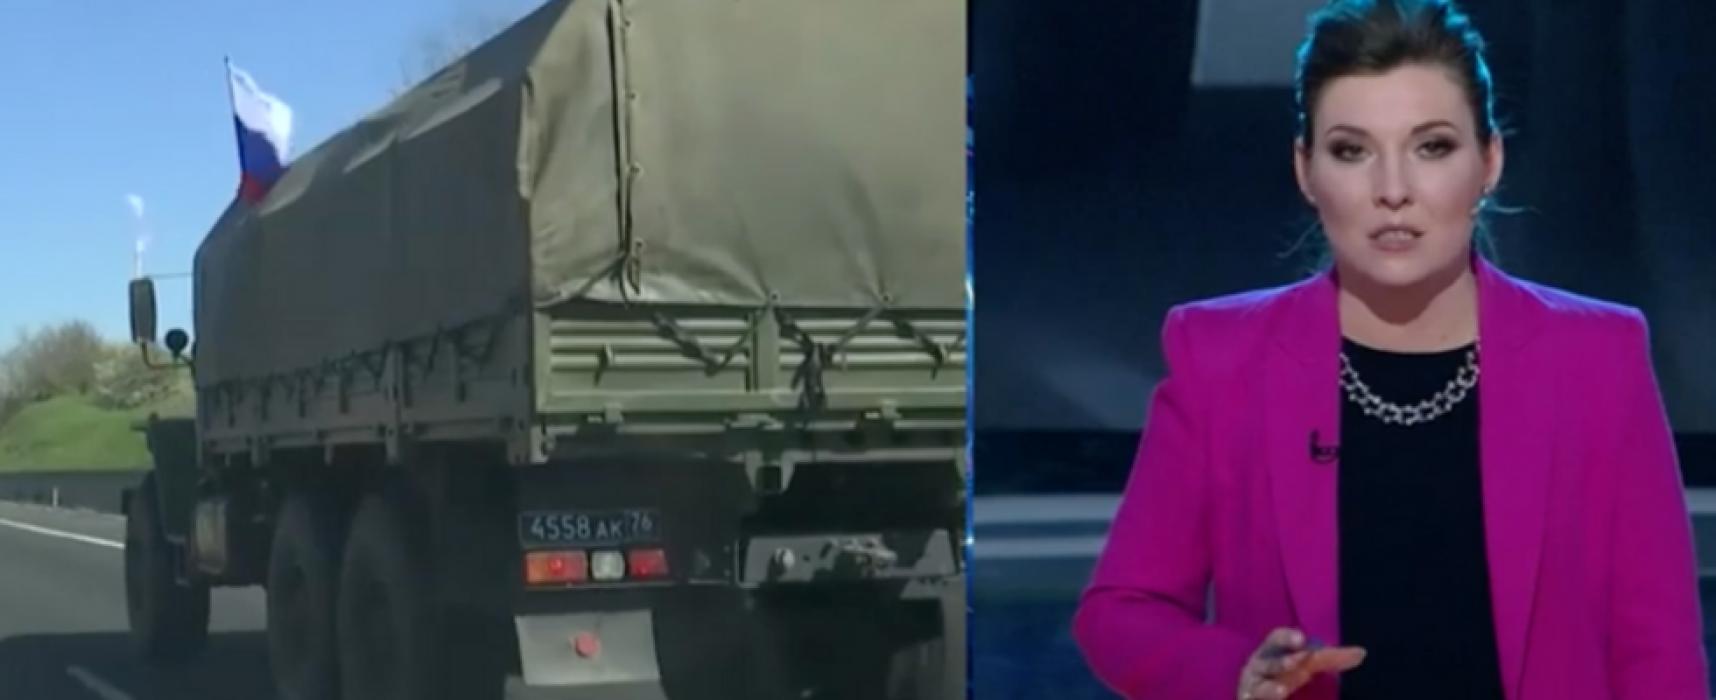 Коронавирус: Би-Би-Си критикует прокремлевские новости из Италии